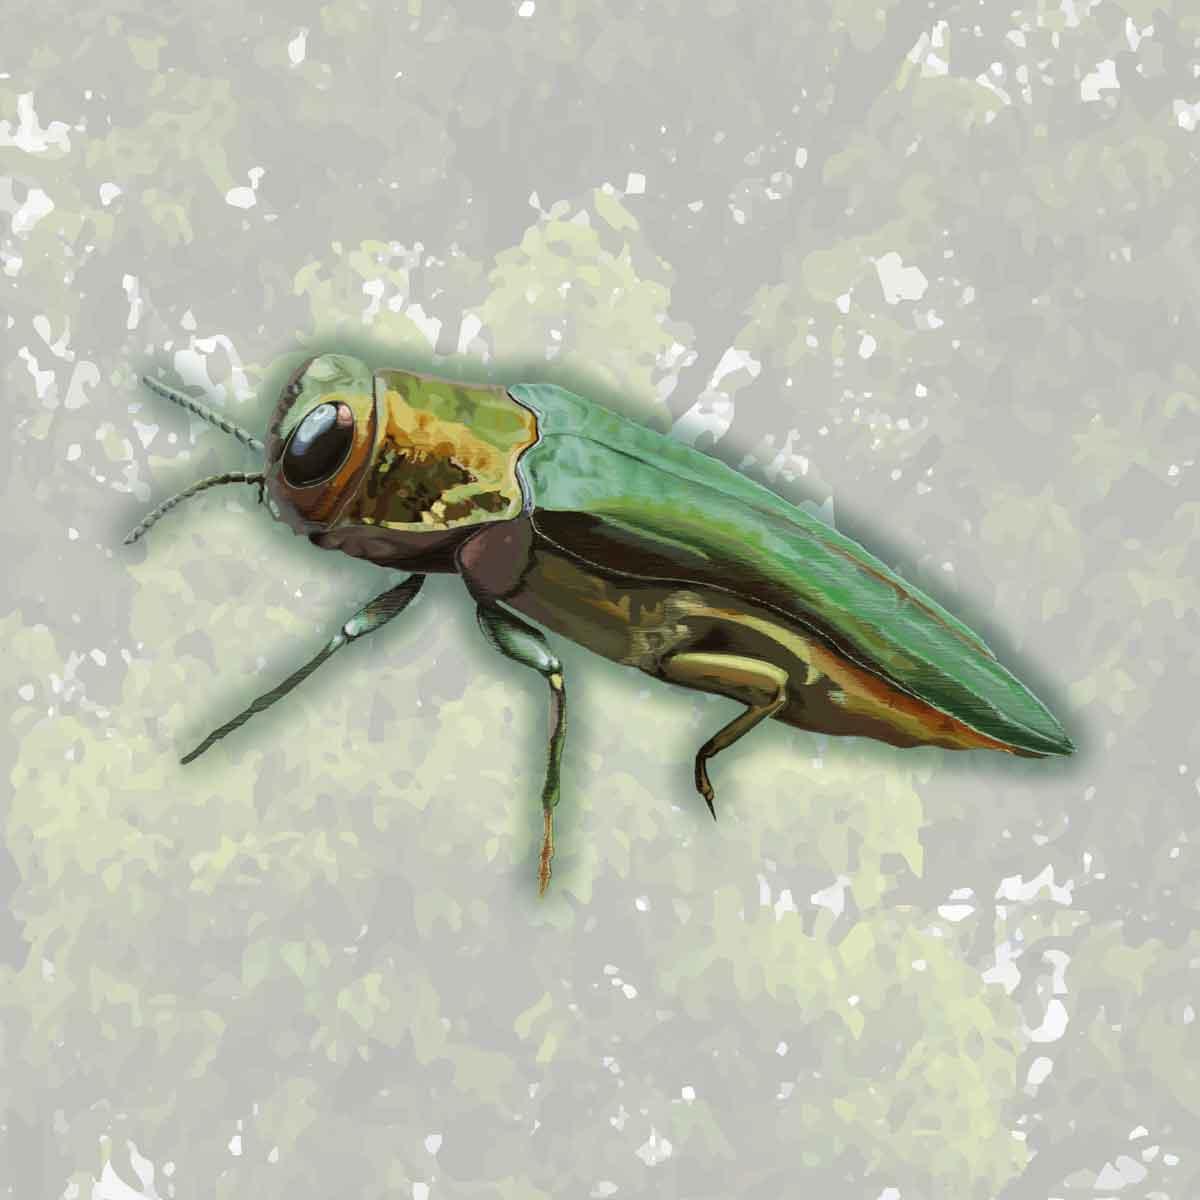 Emerald Ash Borer – Agrilus planipennis